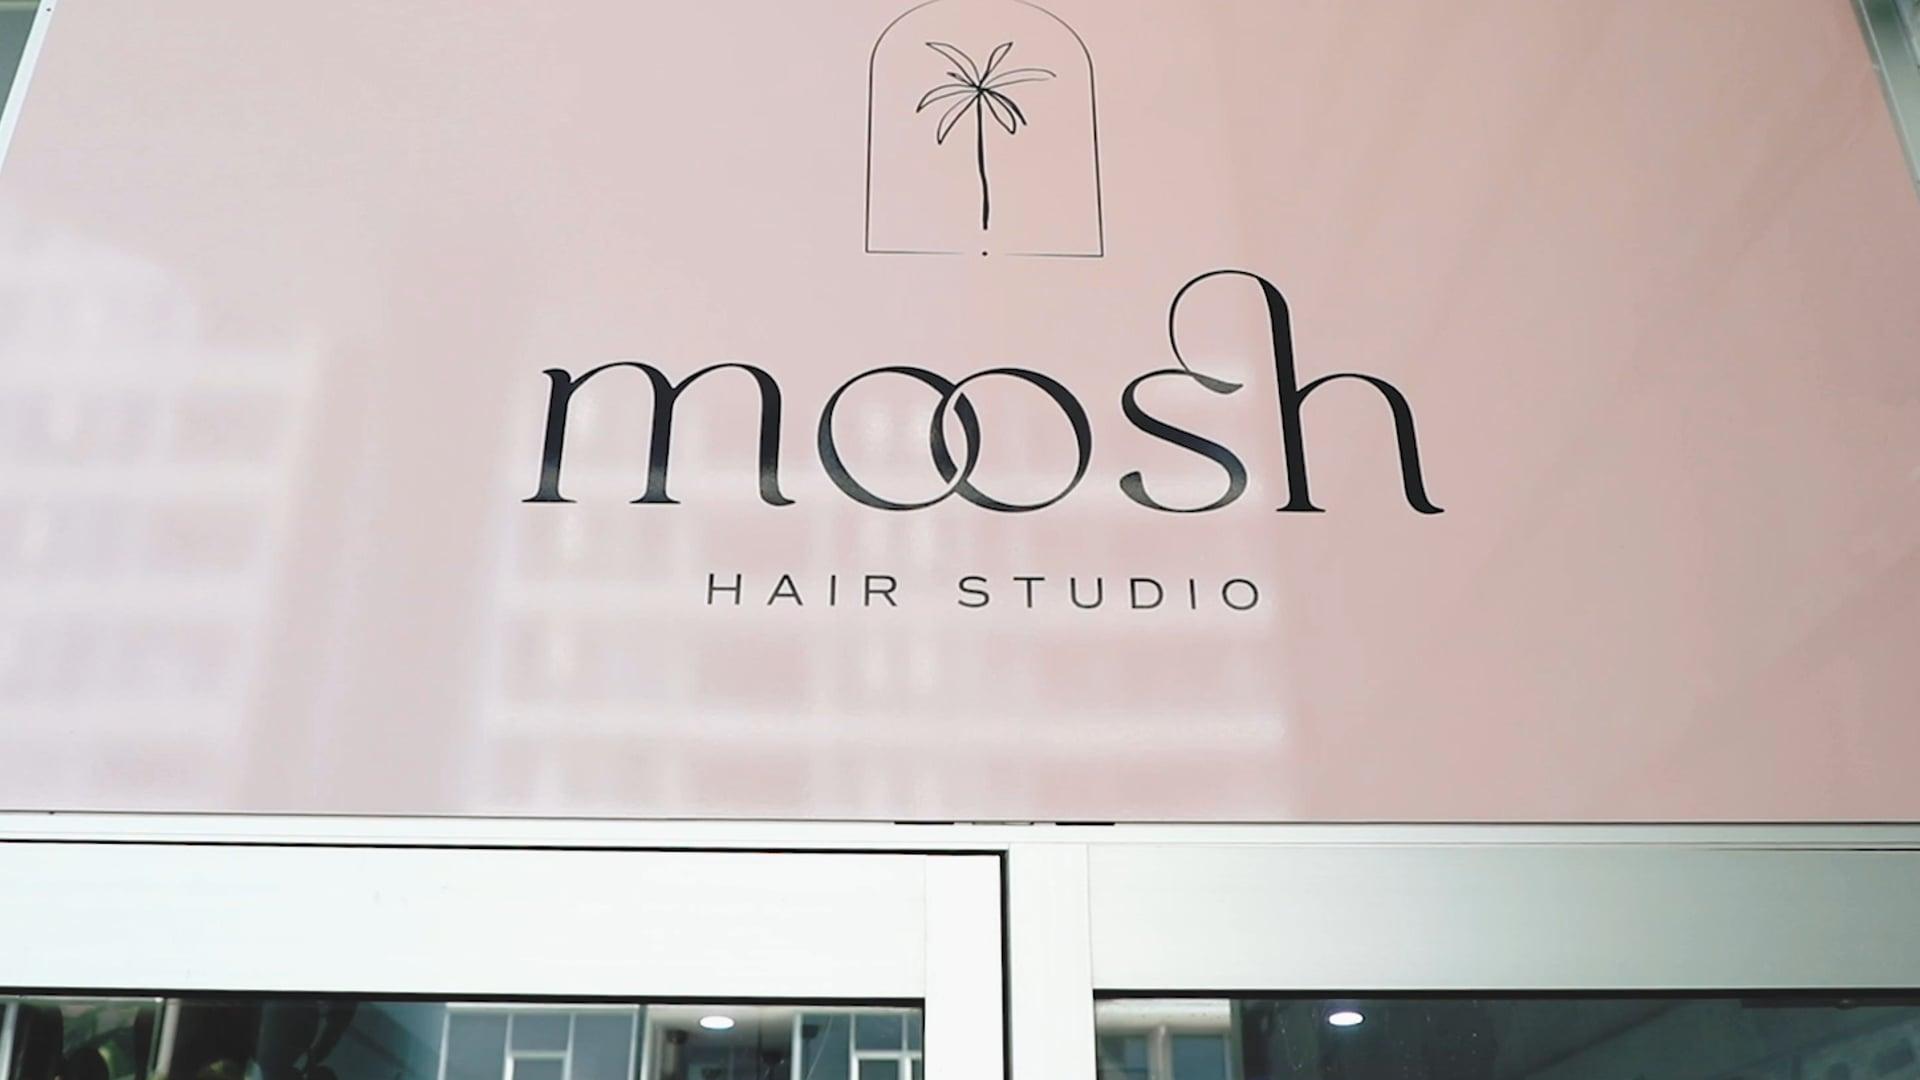 Moosh Hair Studio 2.1